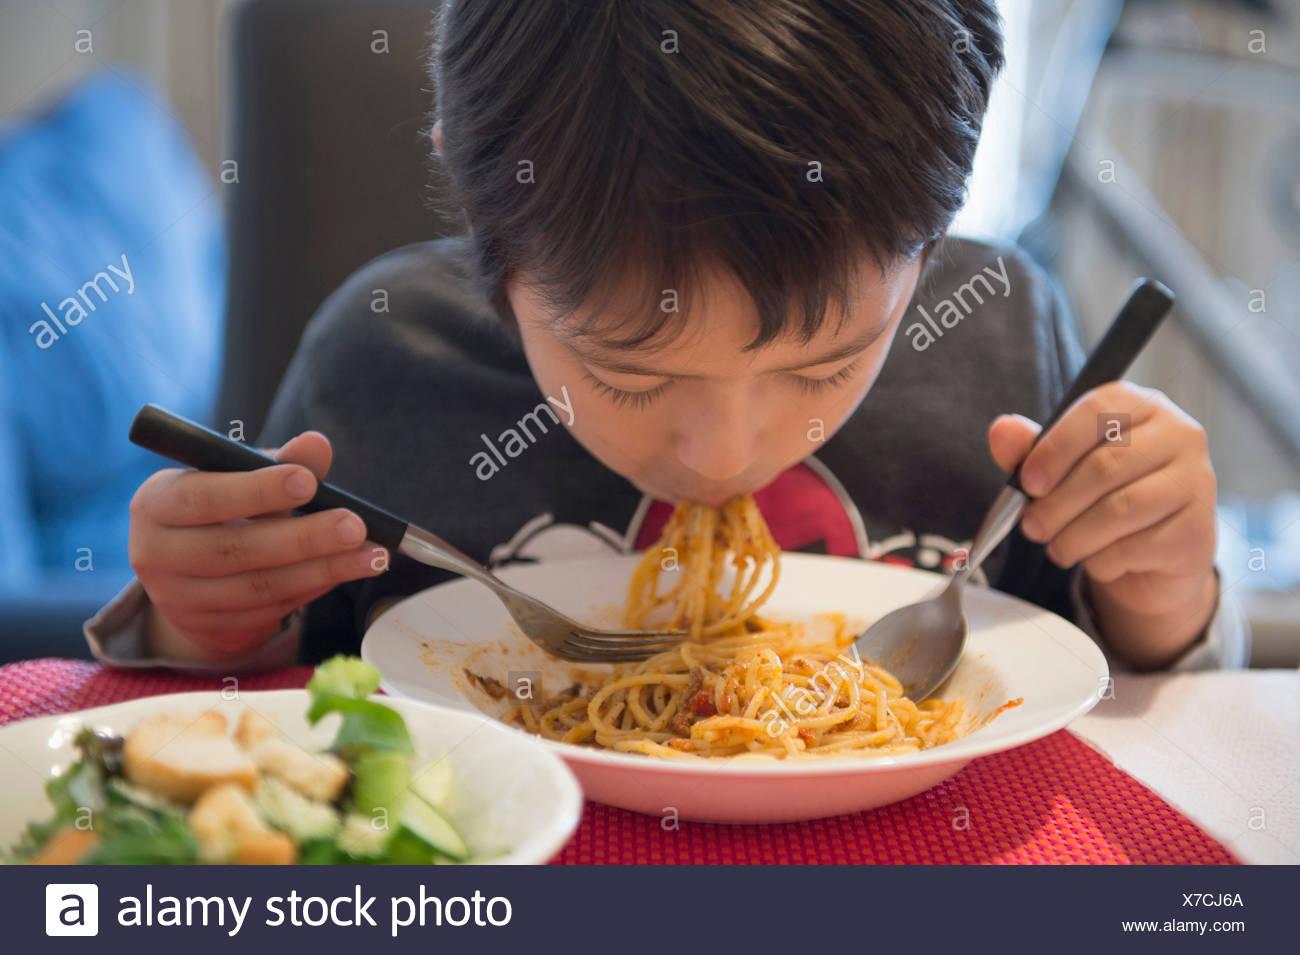 Boy eating spaghetti - Stock Image